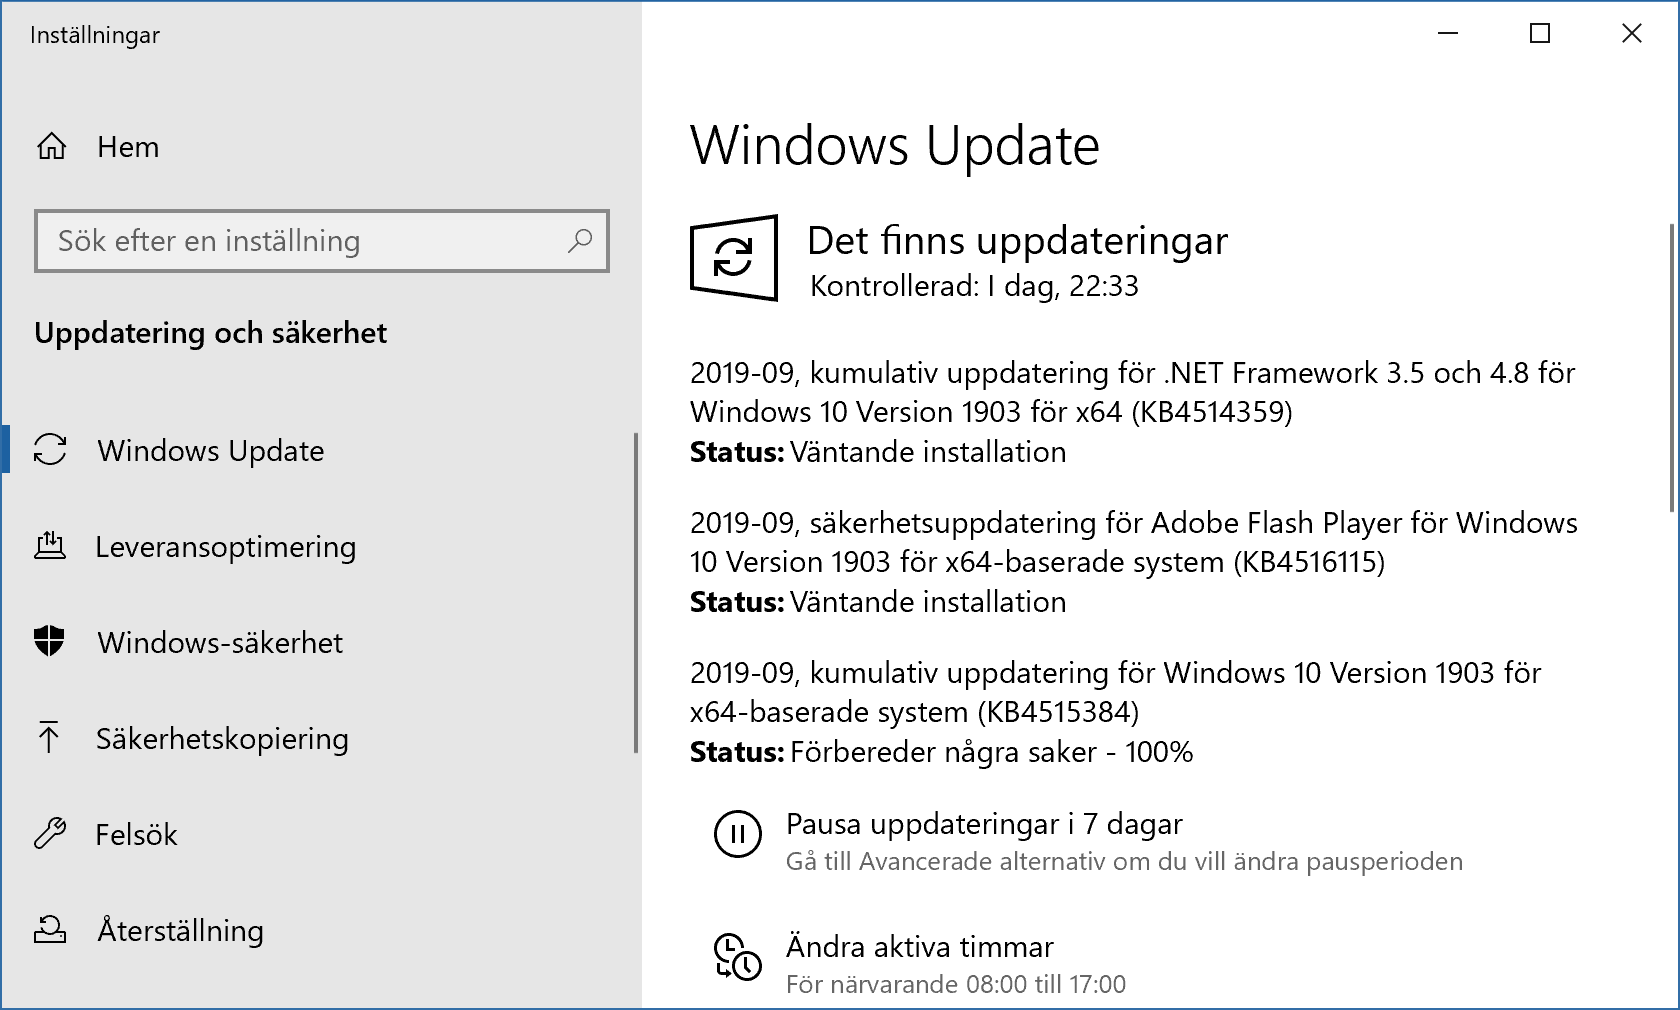 Windows septemberuppdateringar 2019